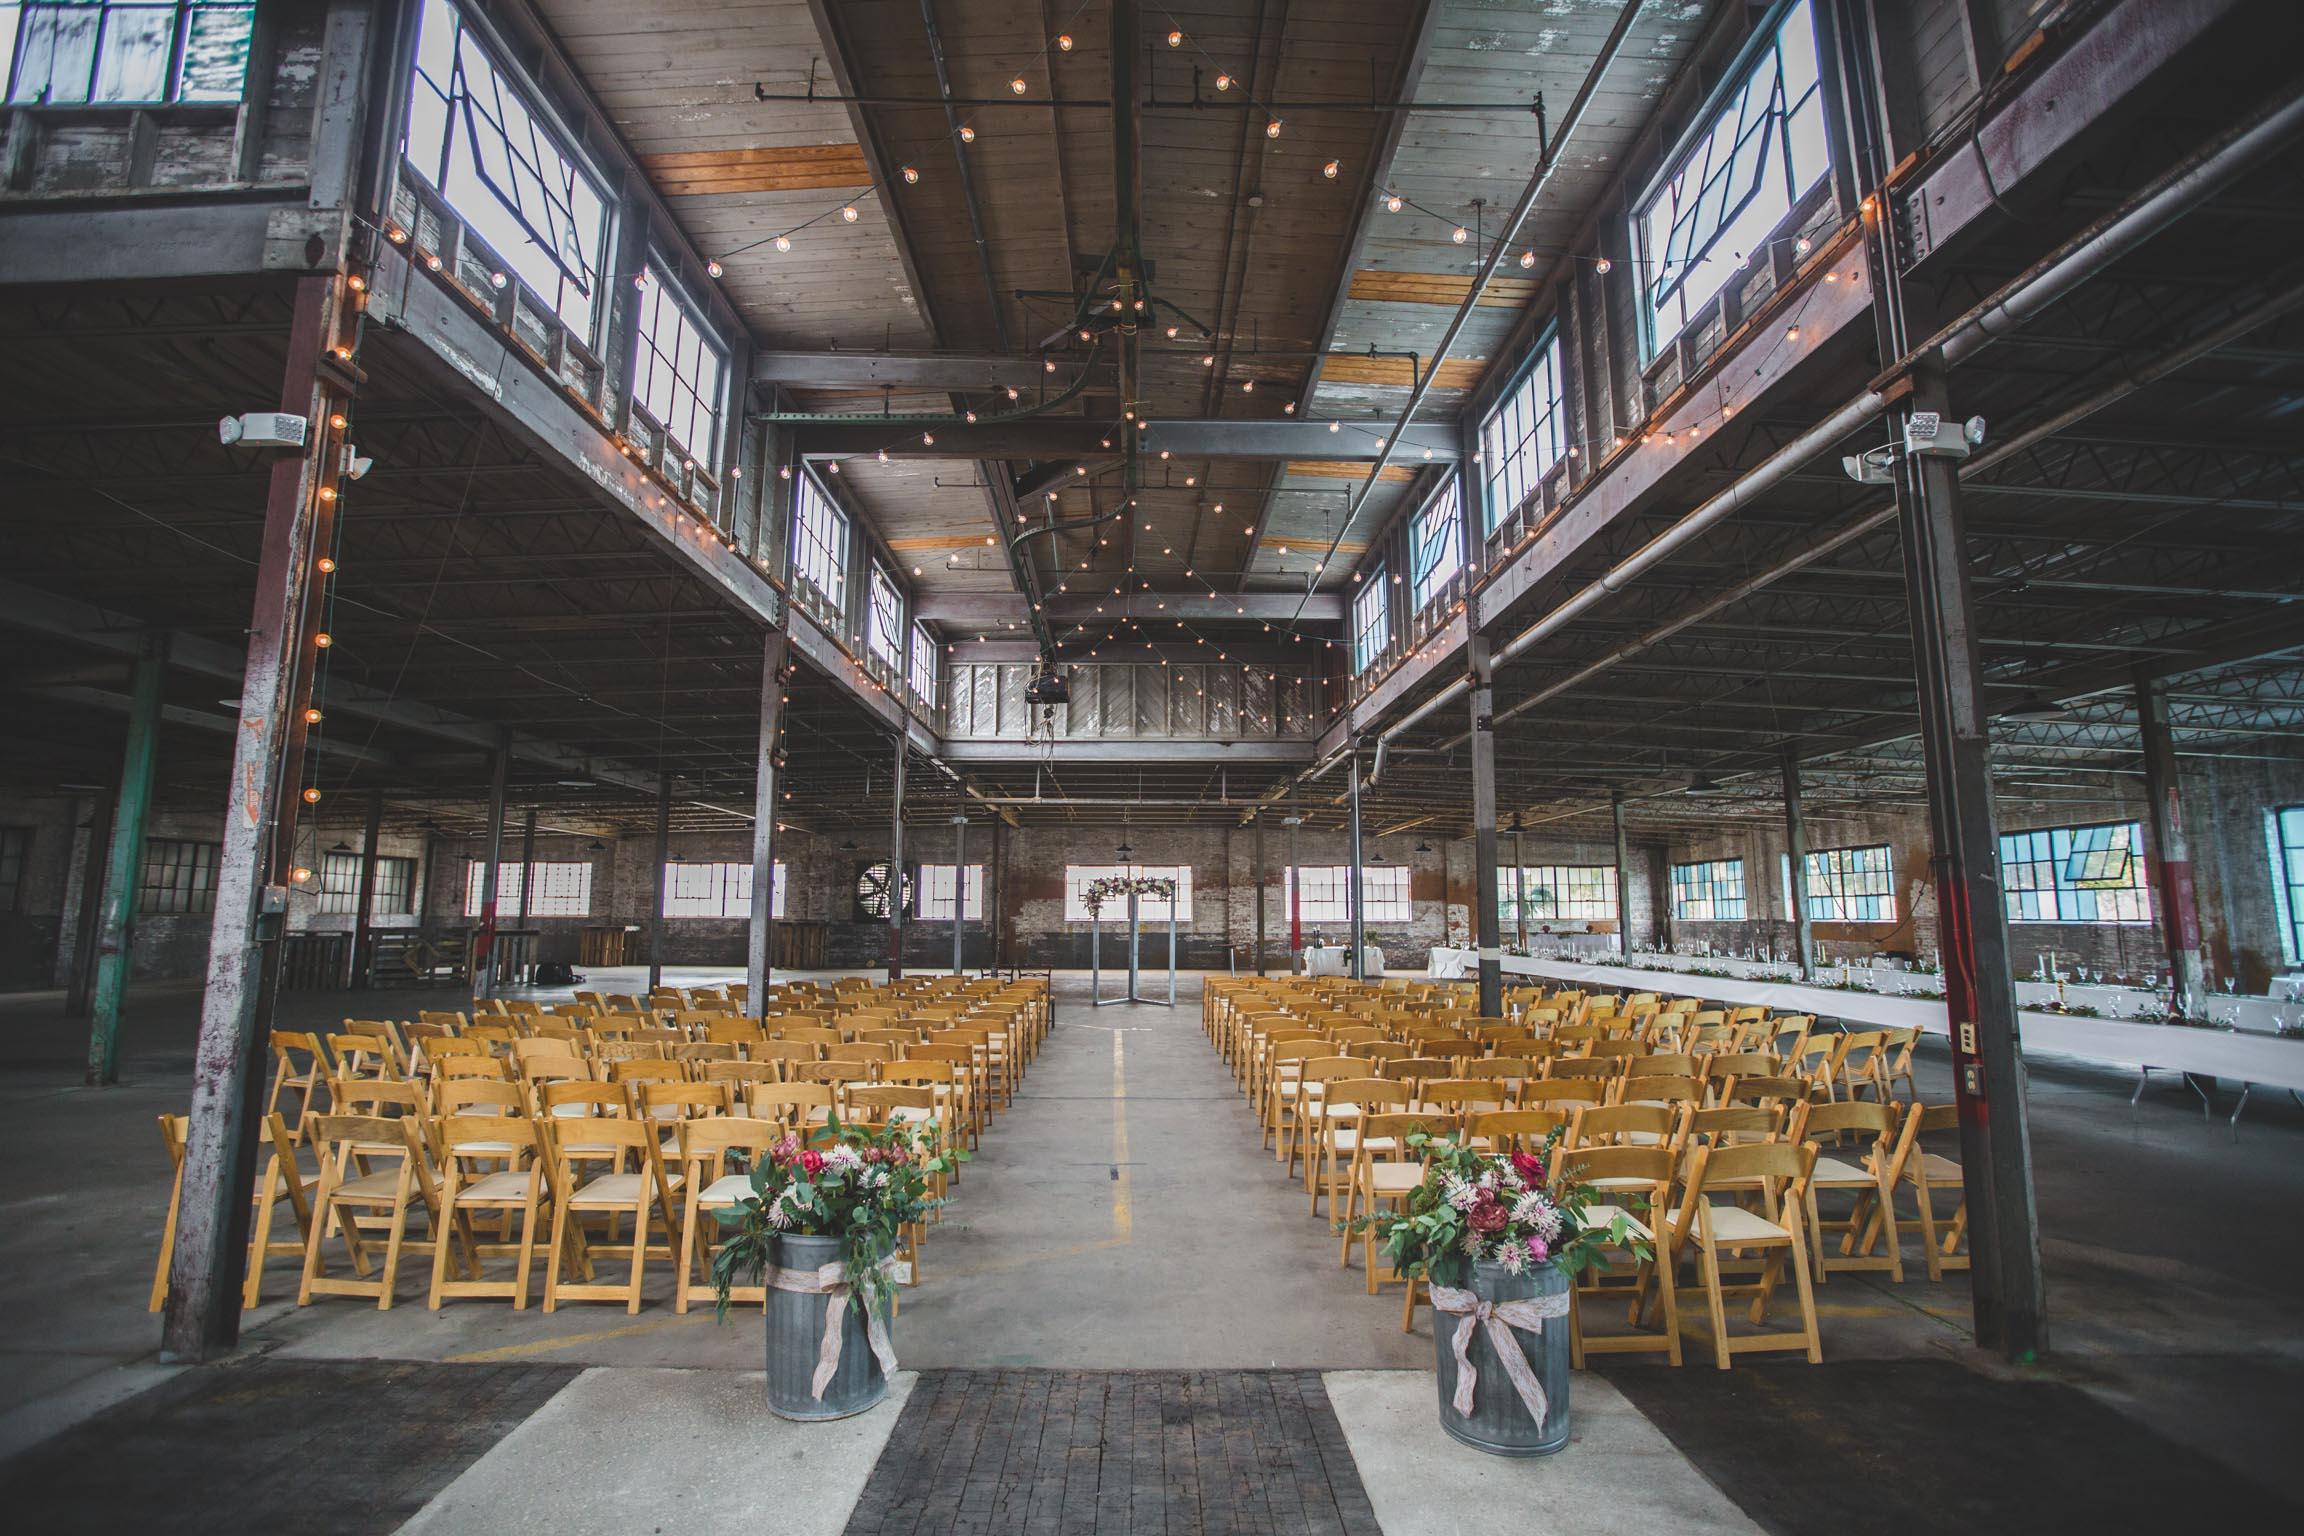 Adam-Szrmack-The-Glass-Factory-Wedding-18.jpg